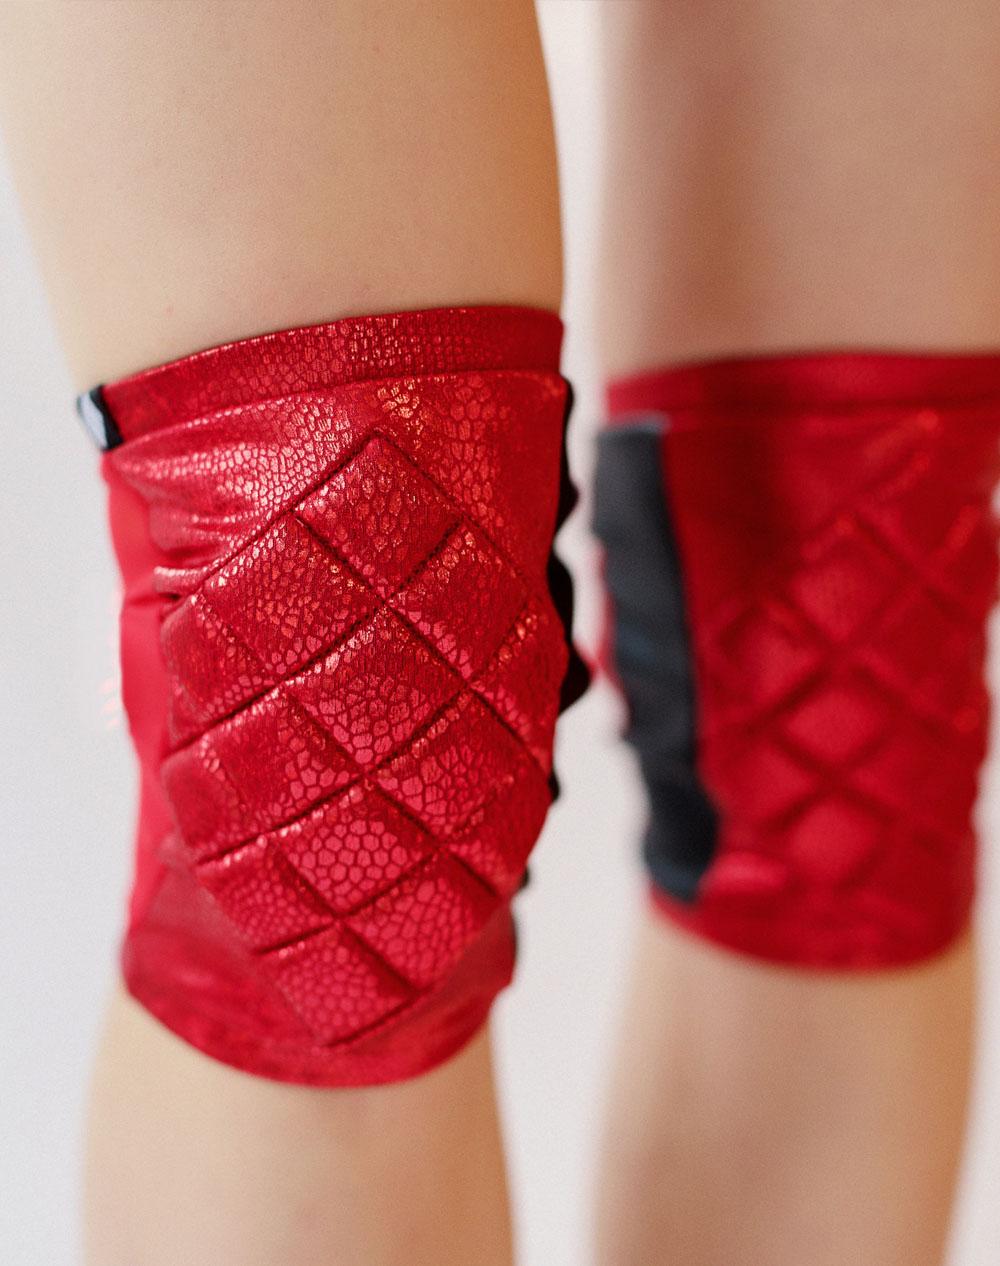 Knee Pads - Shiny Red